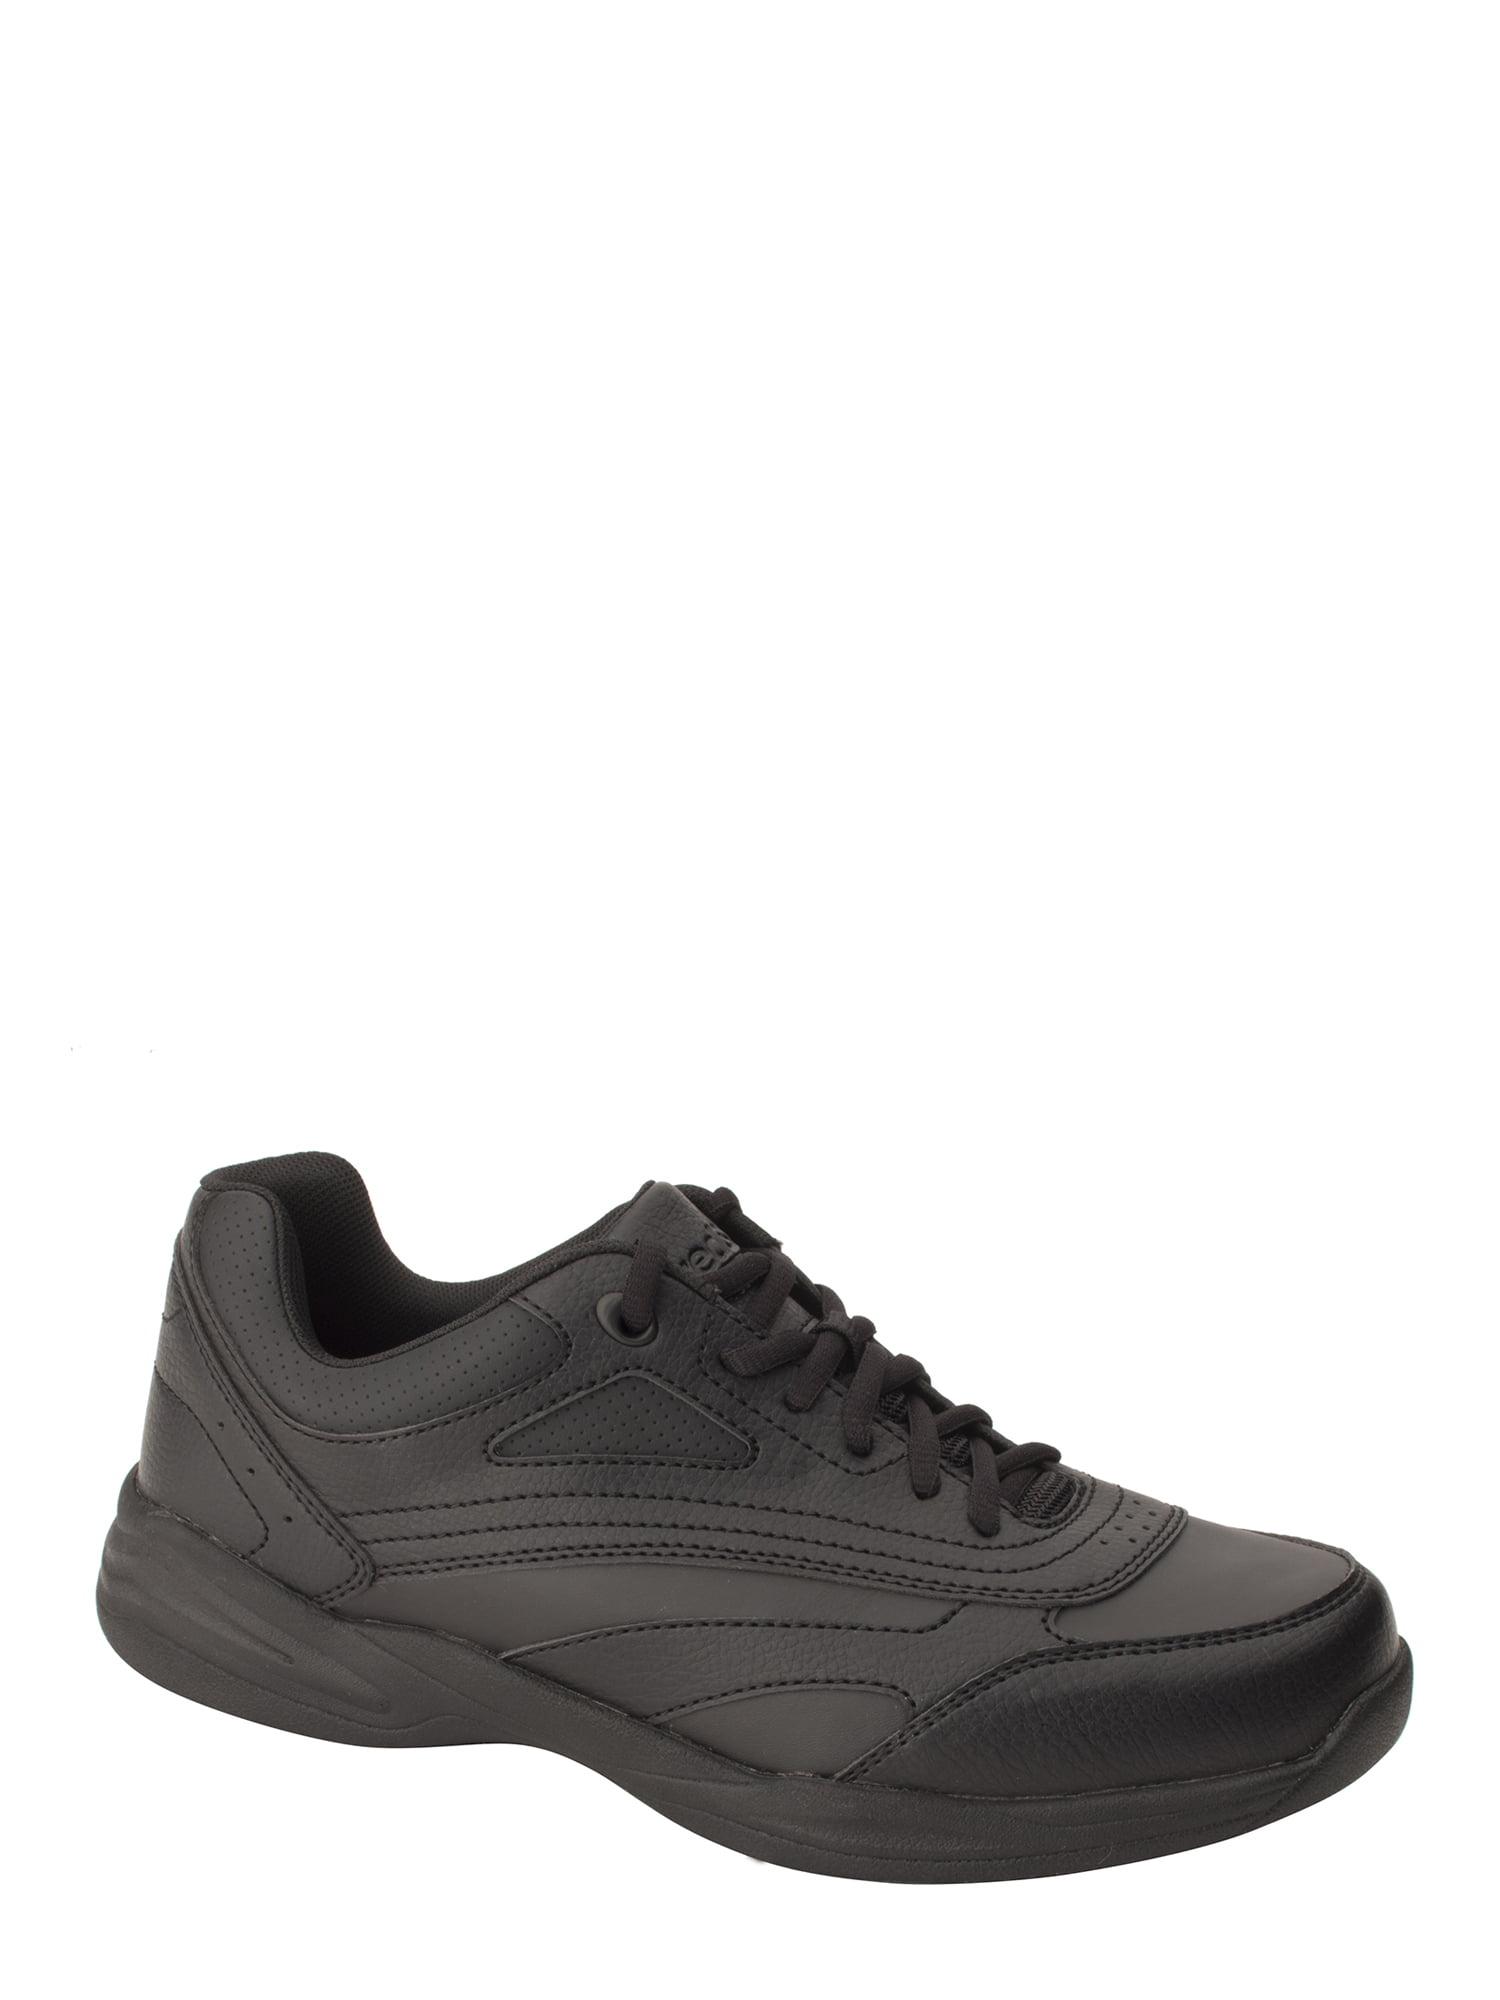 Slip-Resistant Work Shoes - Walmart.com